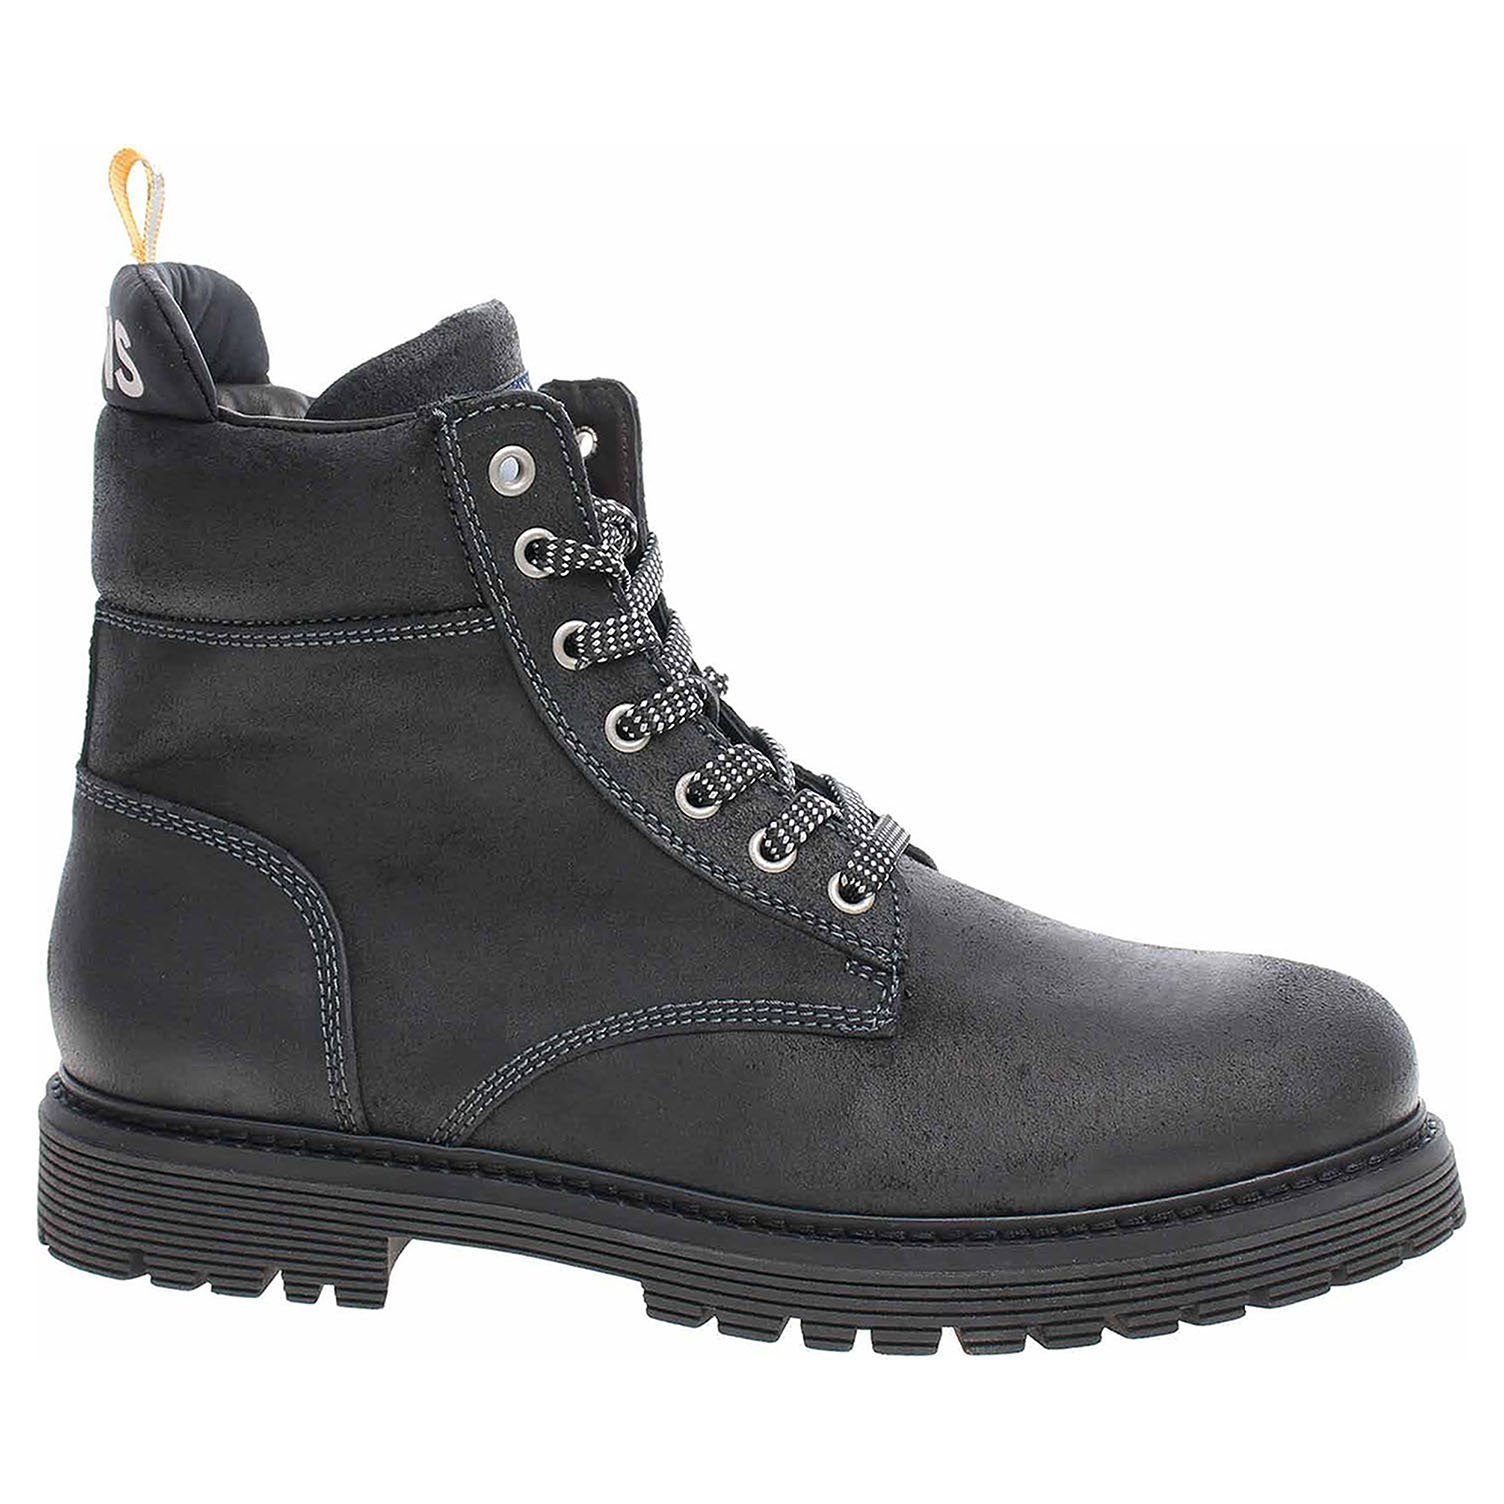 Pánská kotníková obuv Tommy Hilfiger EM0EM00317 008 magnet EM0EM00317 008 41